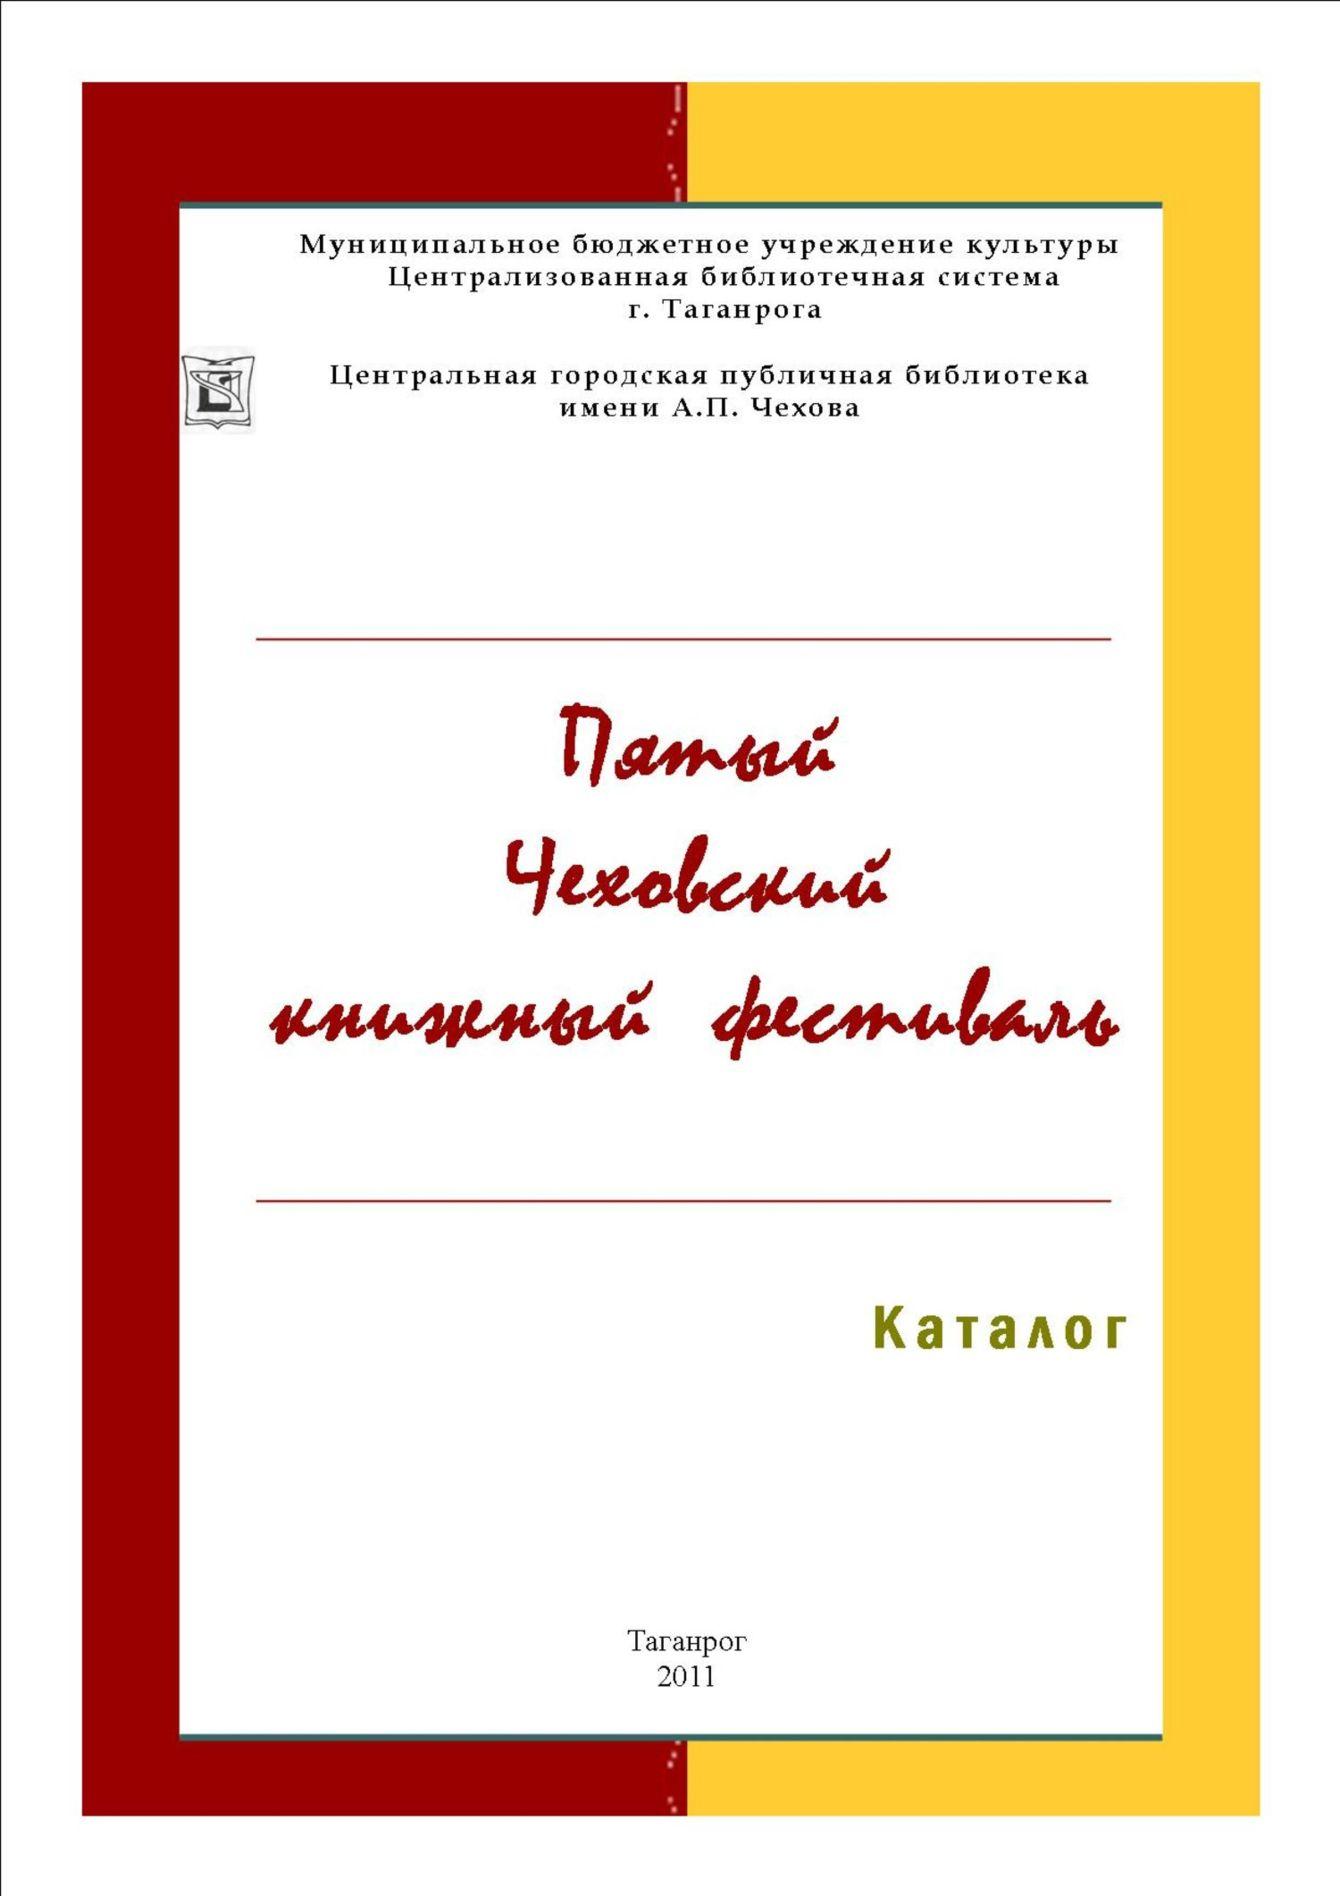 Бурлачков федор николаевич техосмотр